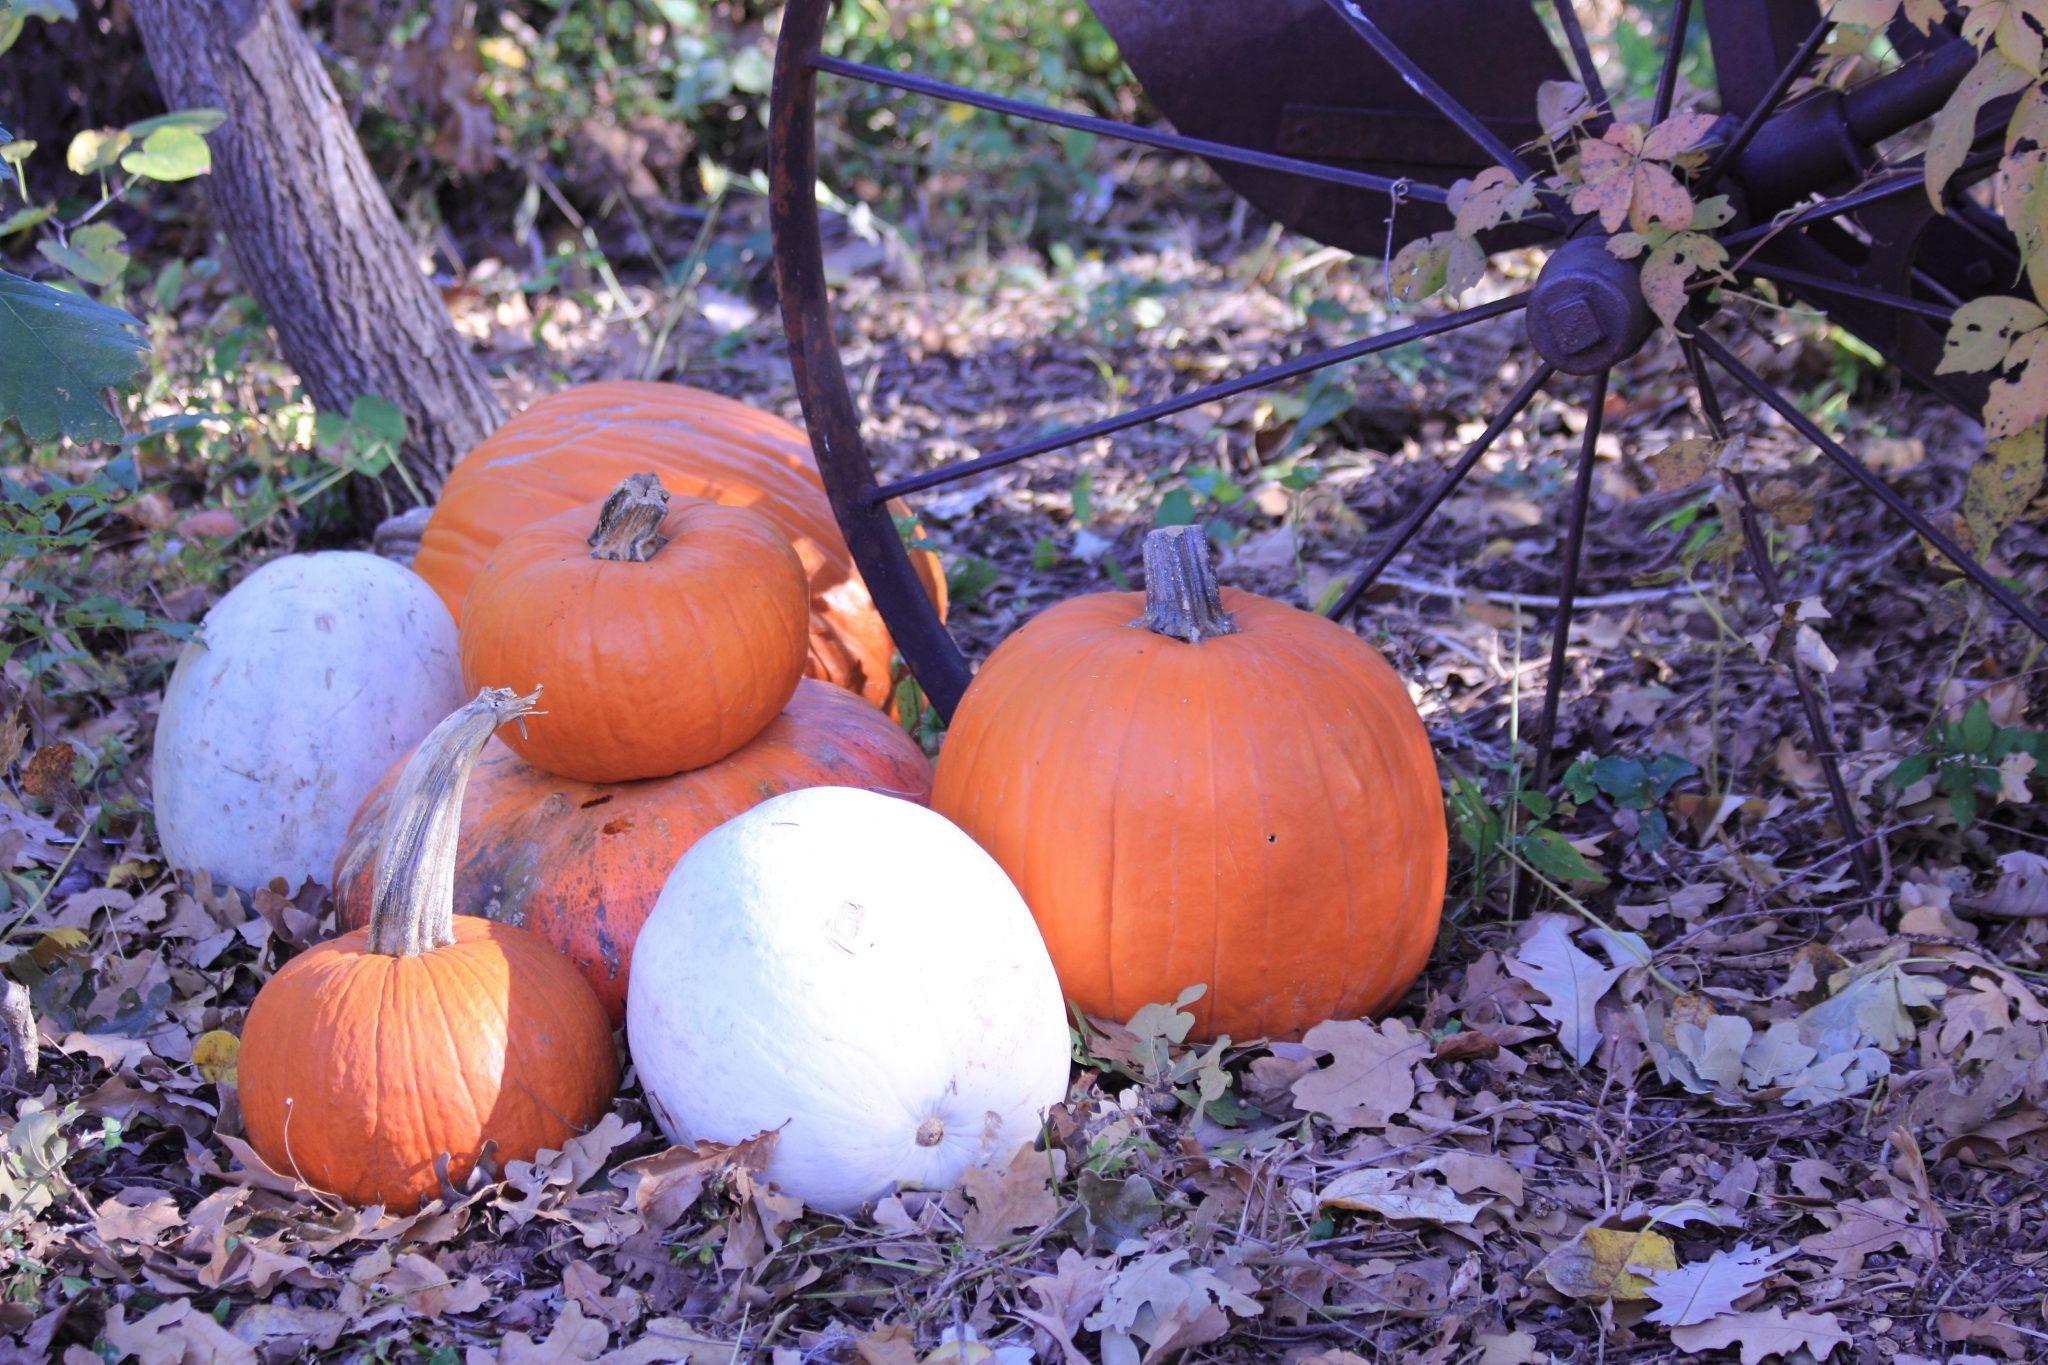 White Pumpkins and Orange Pumpkins